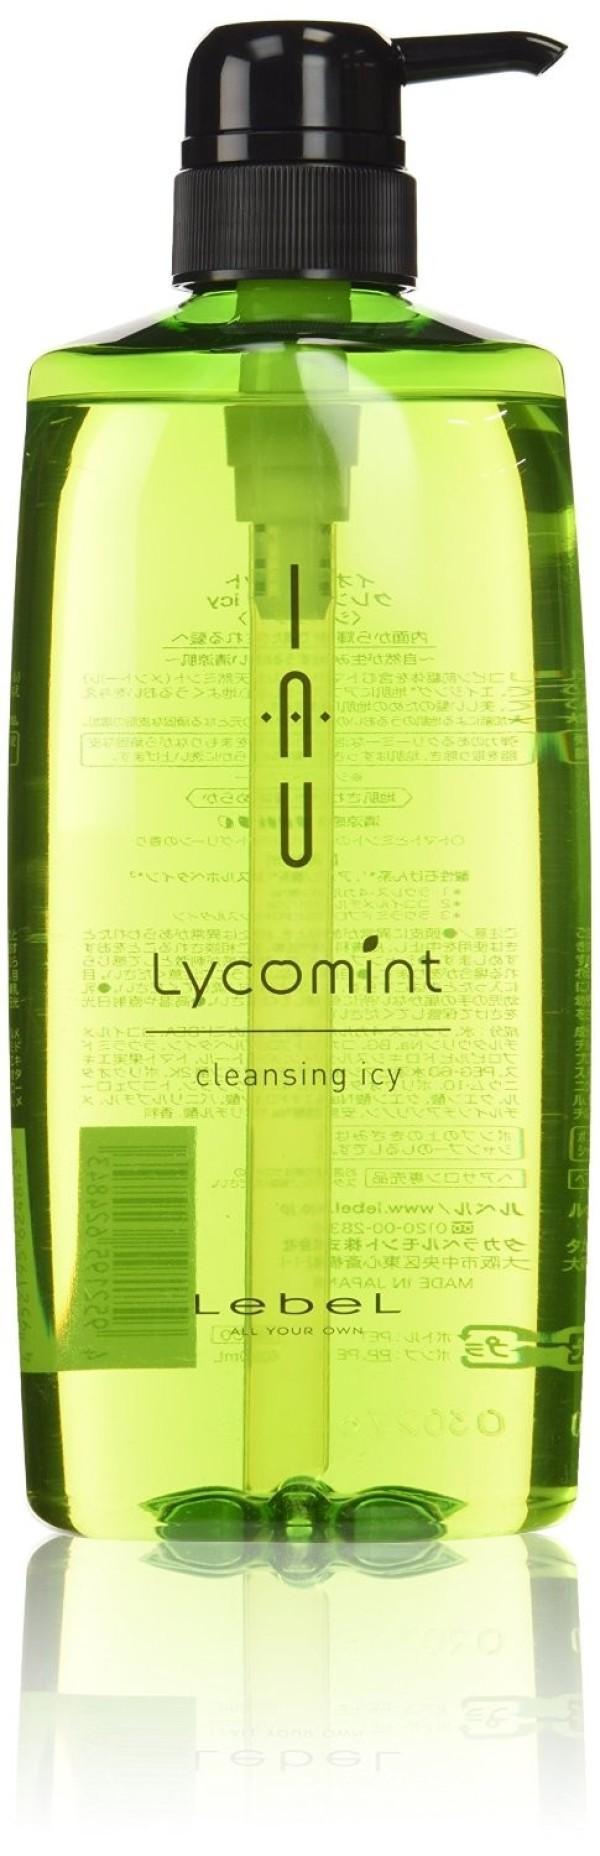 Lebel IAU Lycomint Cleansing Icy Shampoo 600 ml